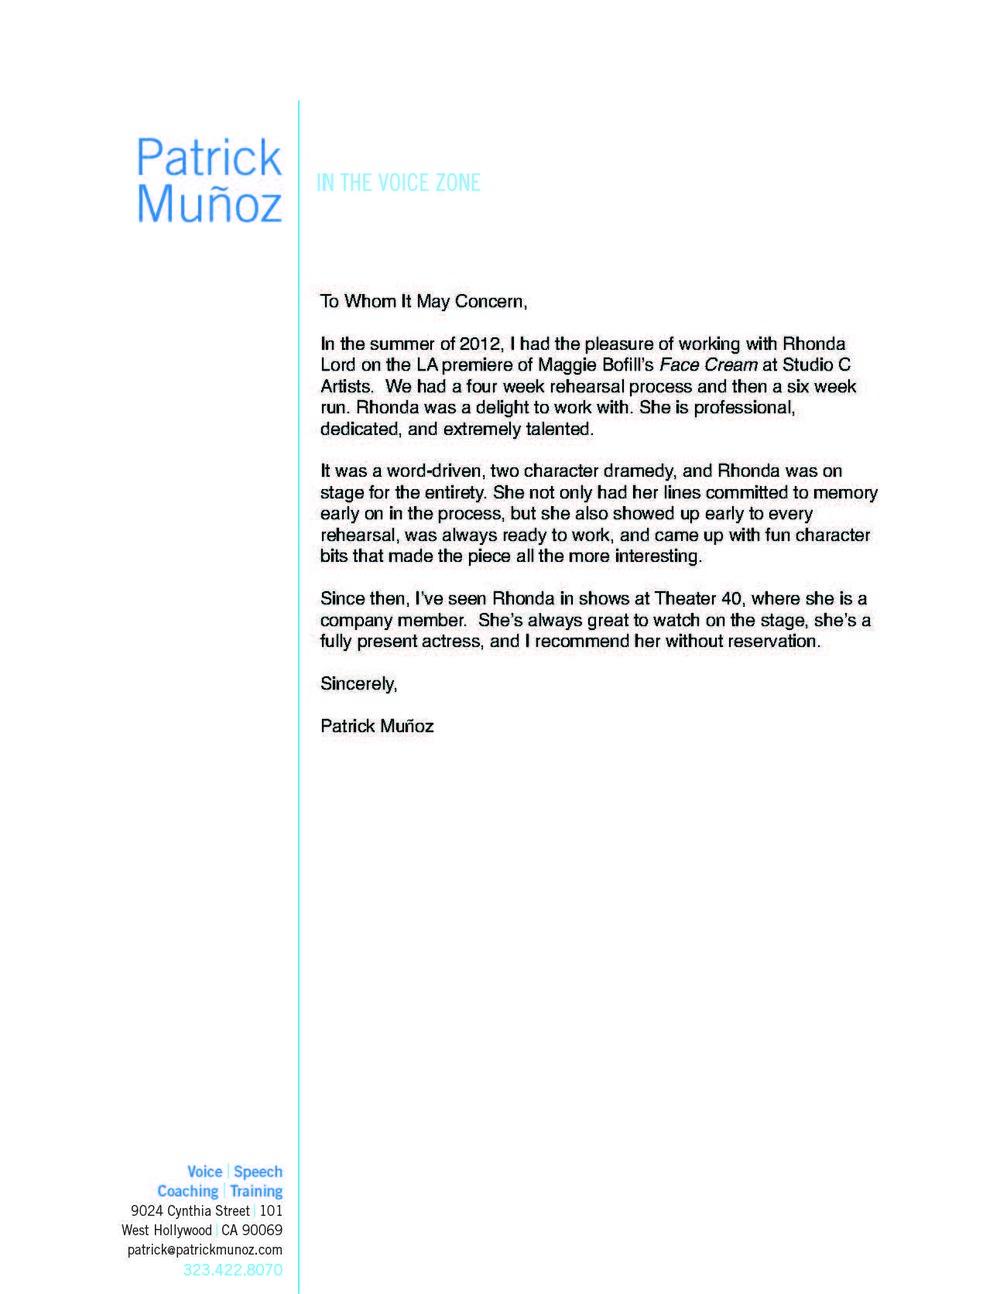 PM-letterhead Rec.jpg